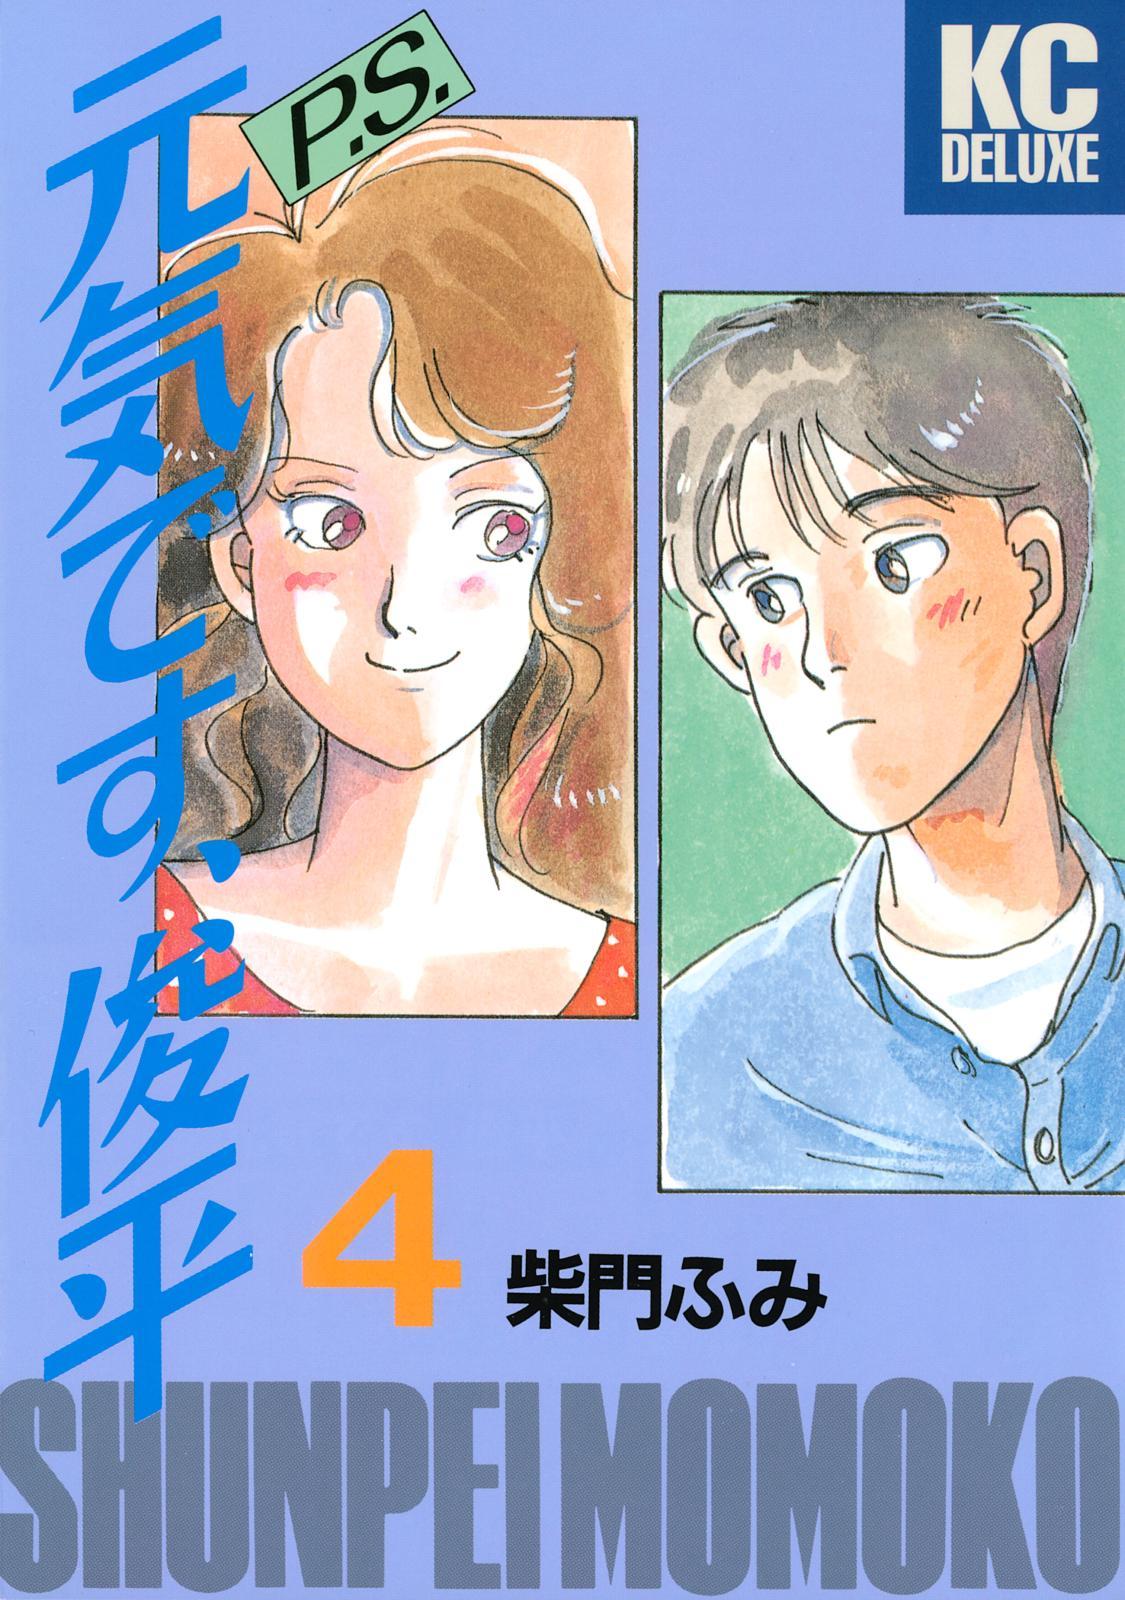 P.S.元気です、俊平(4)